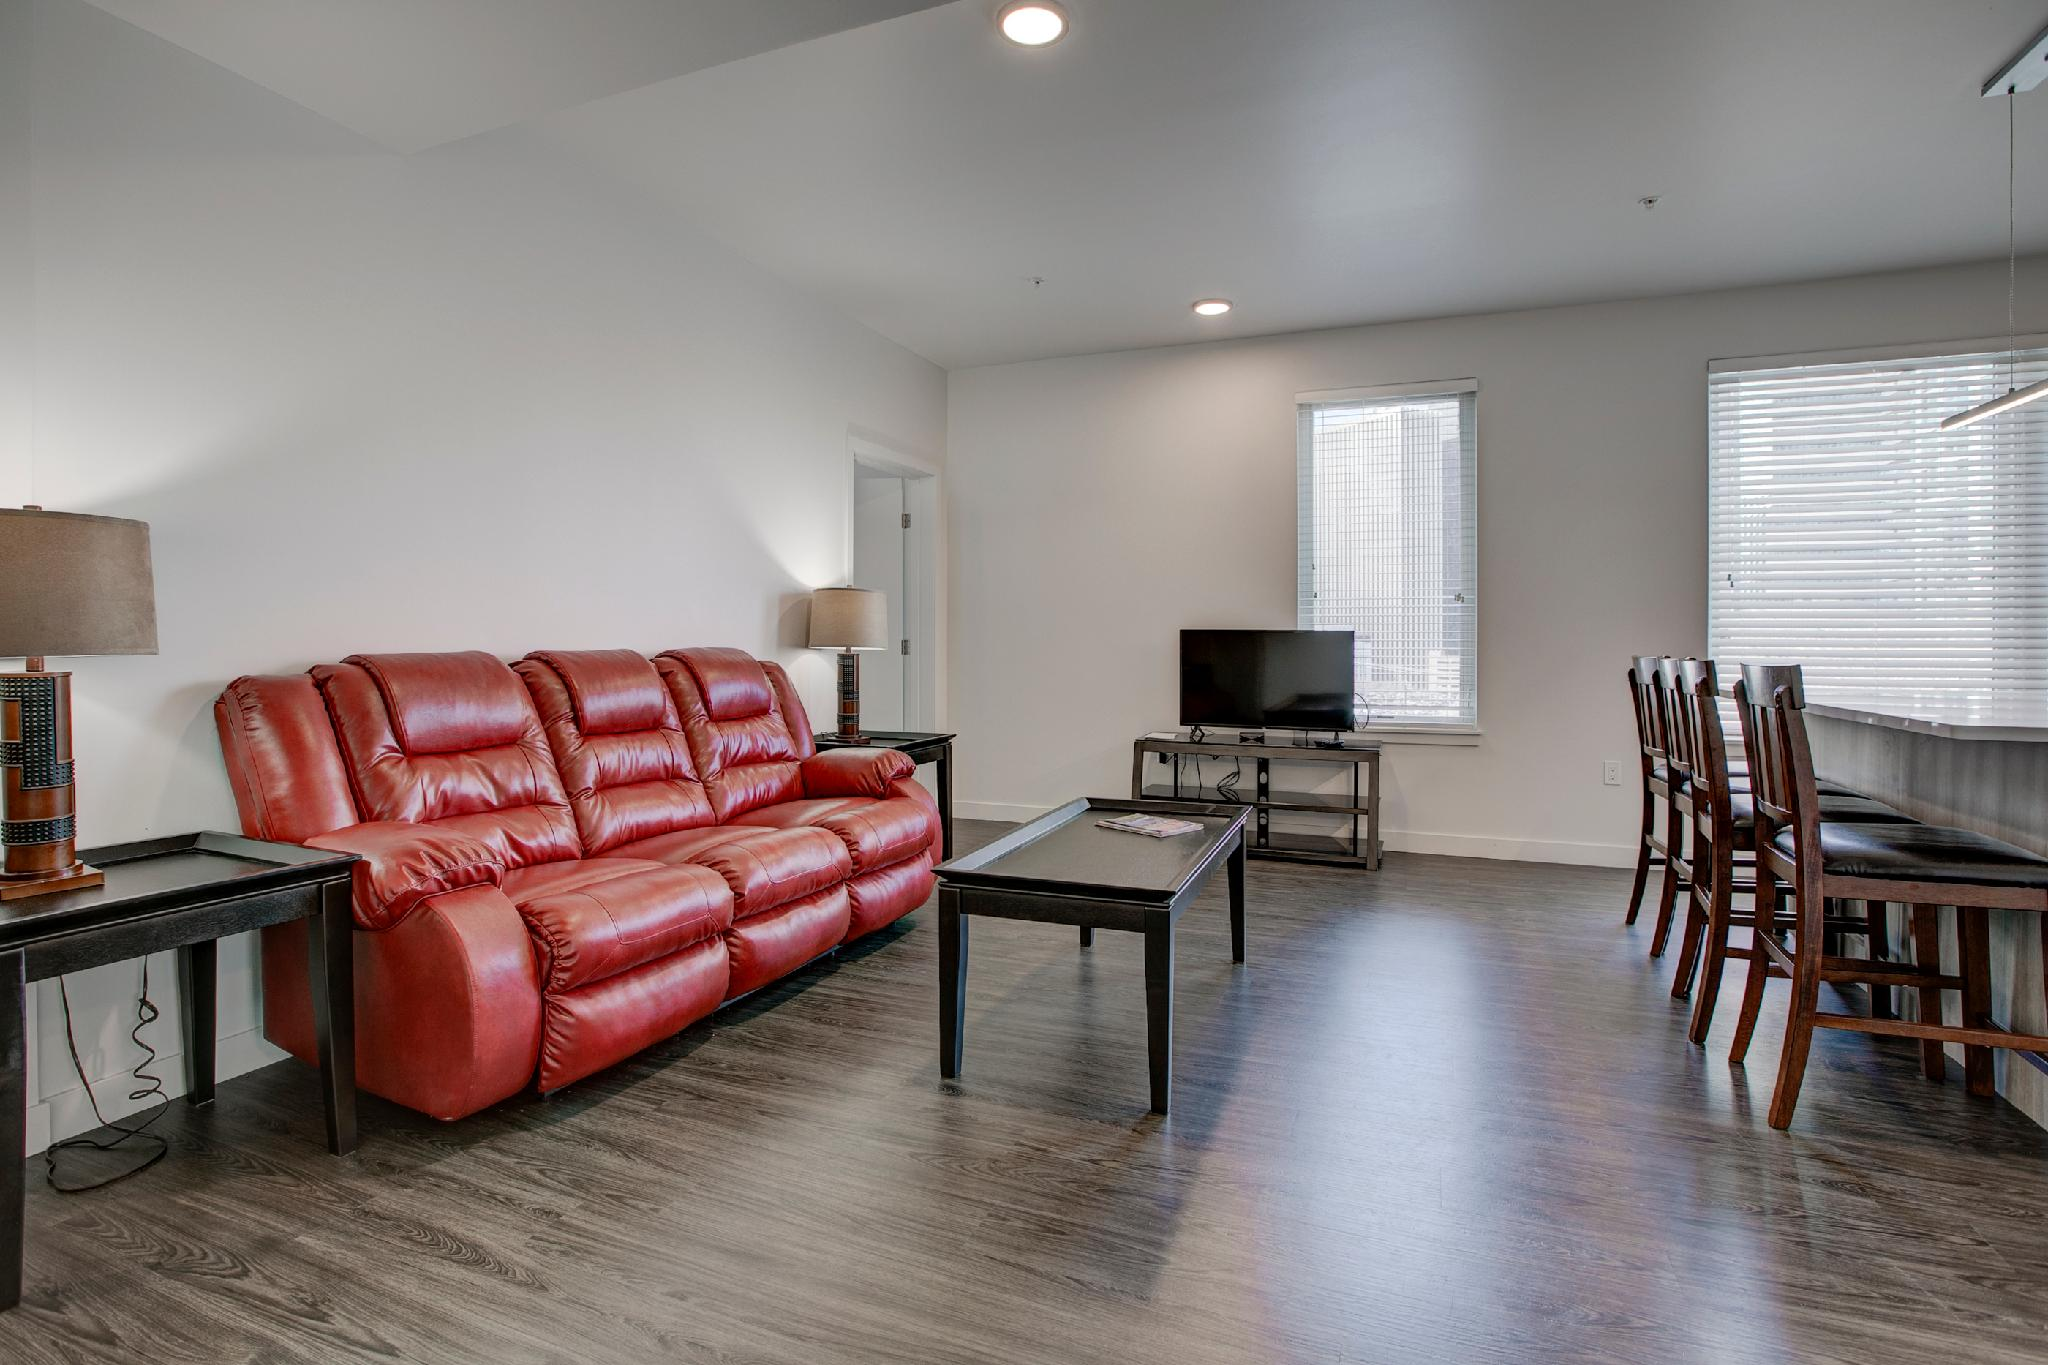 Sova 529 · SoBe Downtown Denver Apartments (Master)